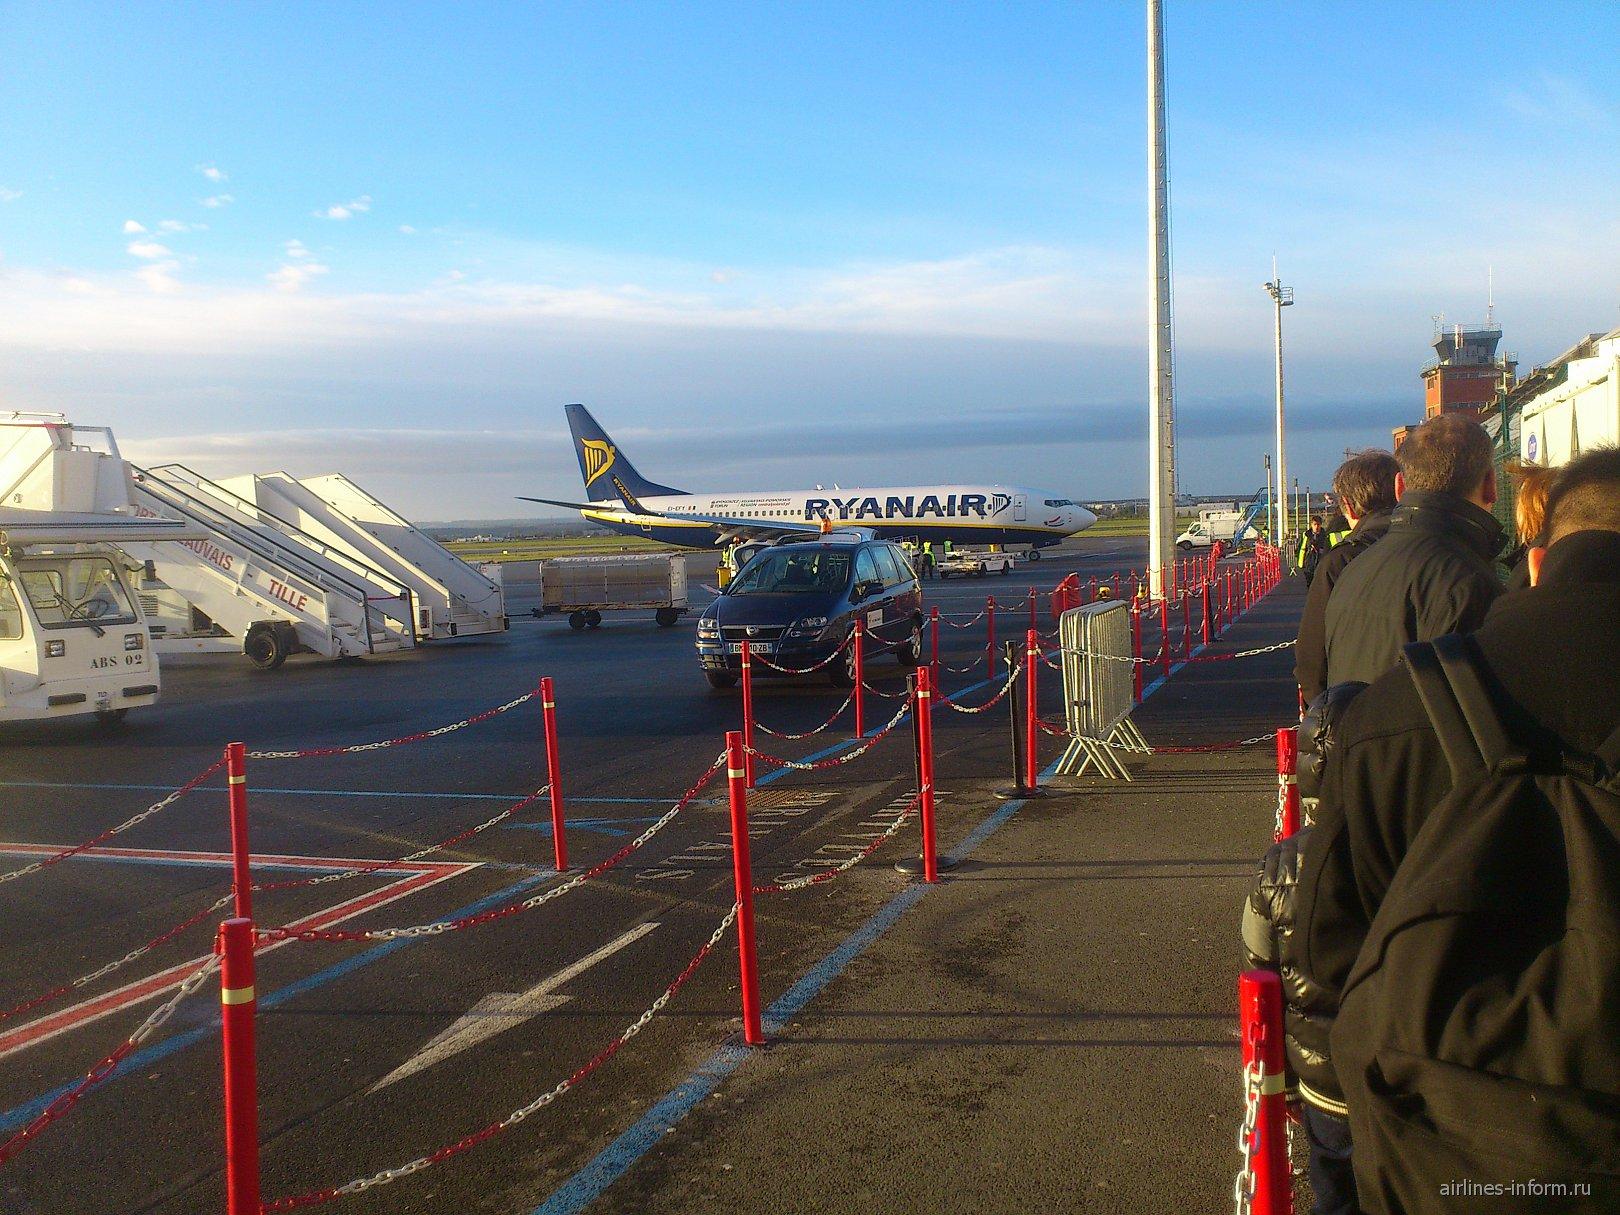 Самолет авиакомпании Ryanair в аэропорту Париж Бове